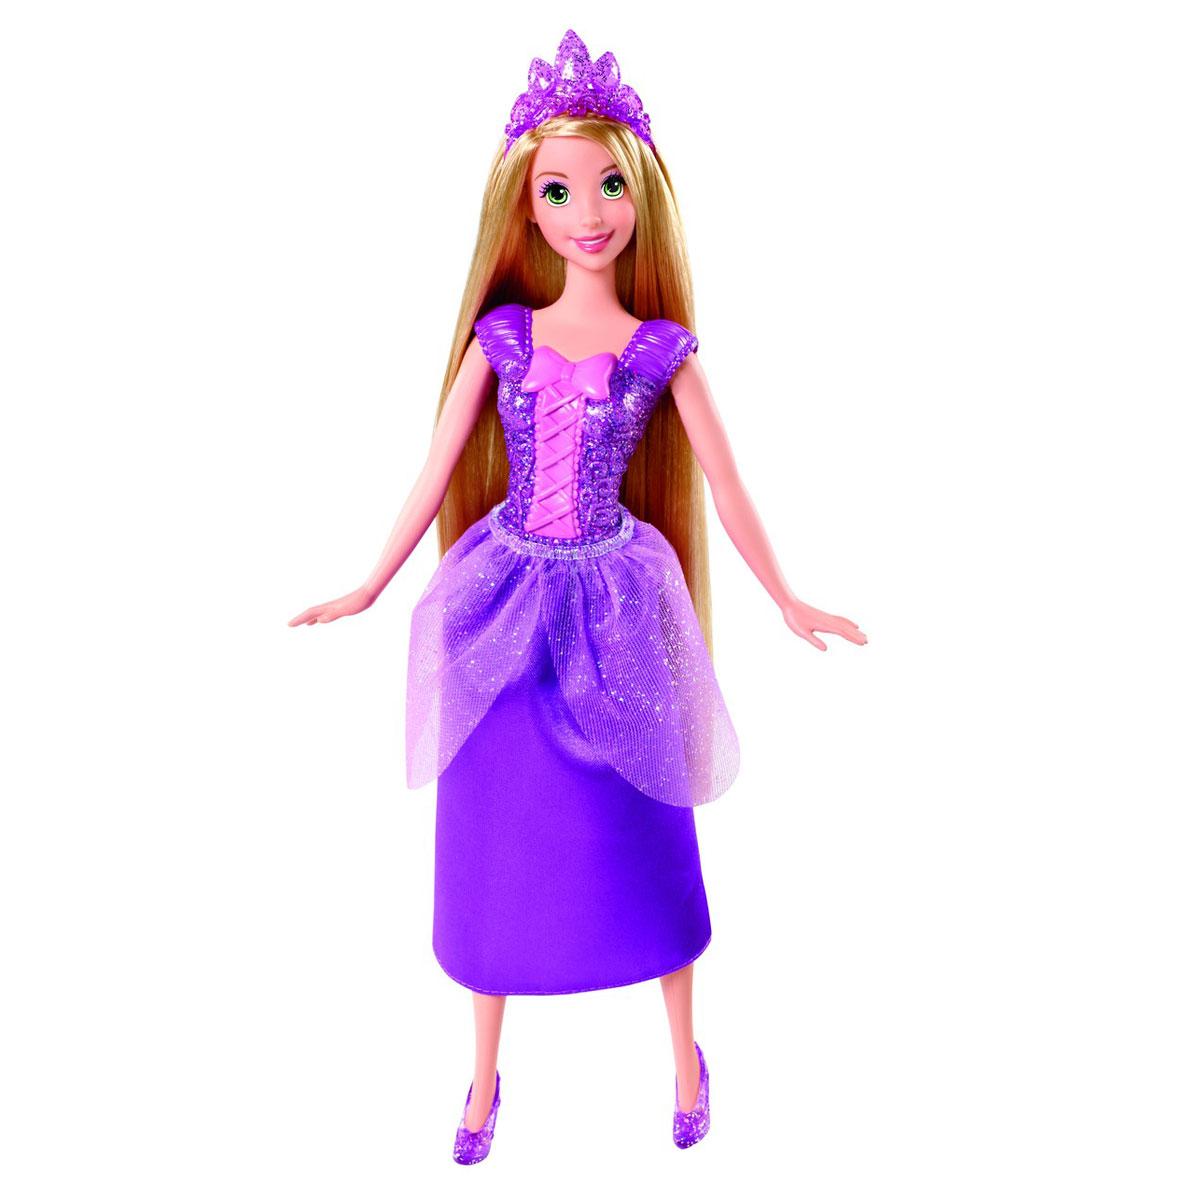 Disney Princess ����� ��������� � ���������� ������ ���������